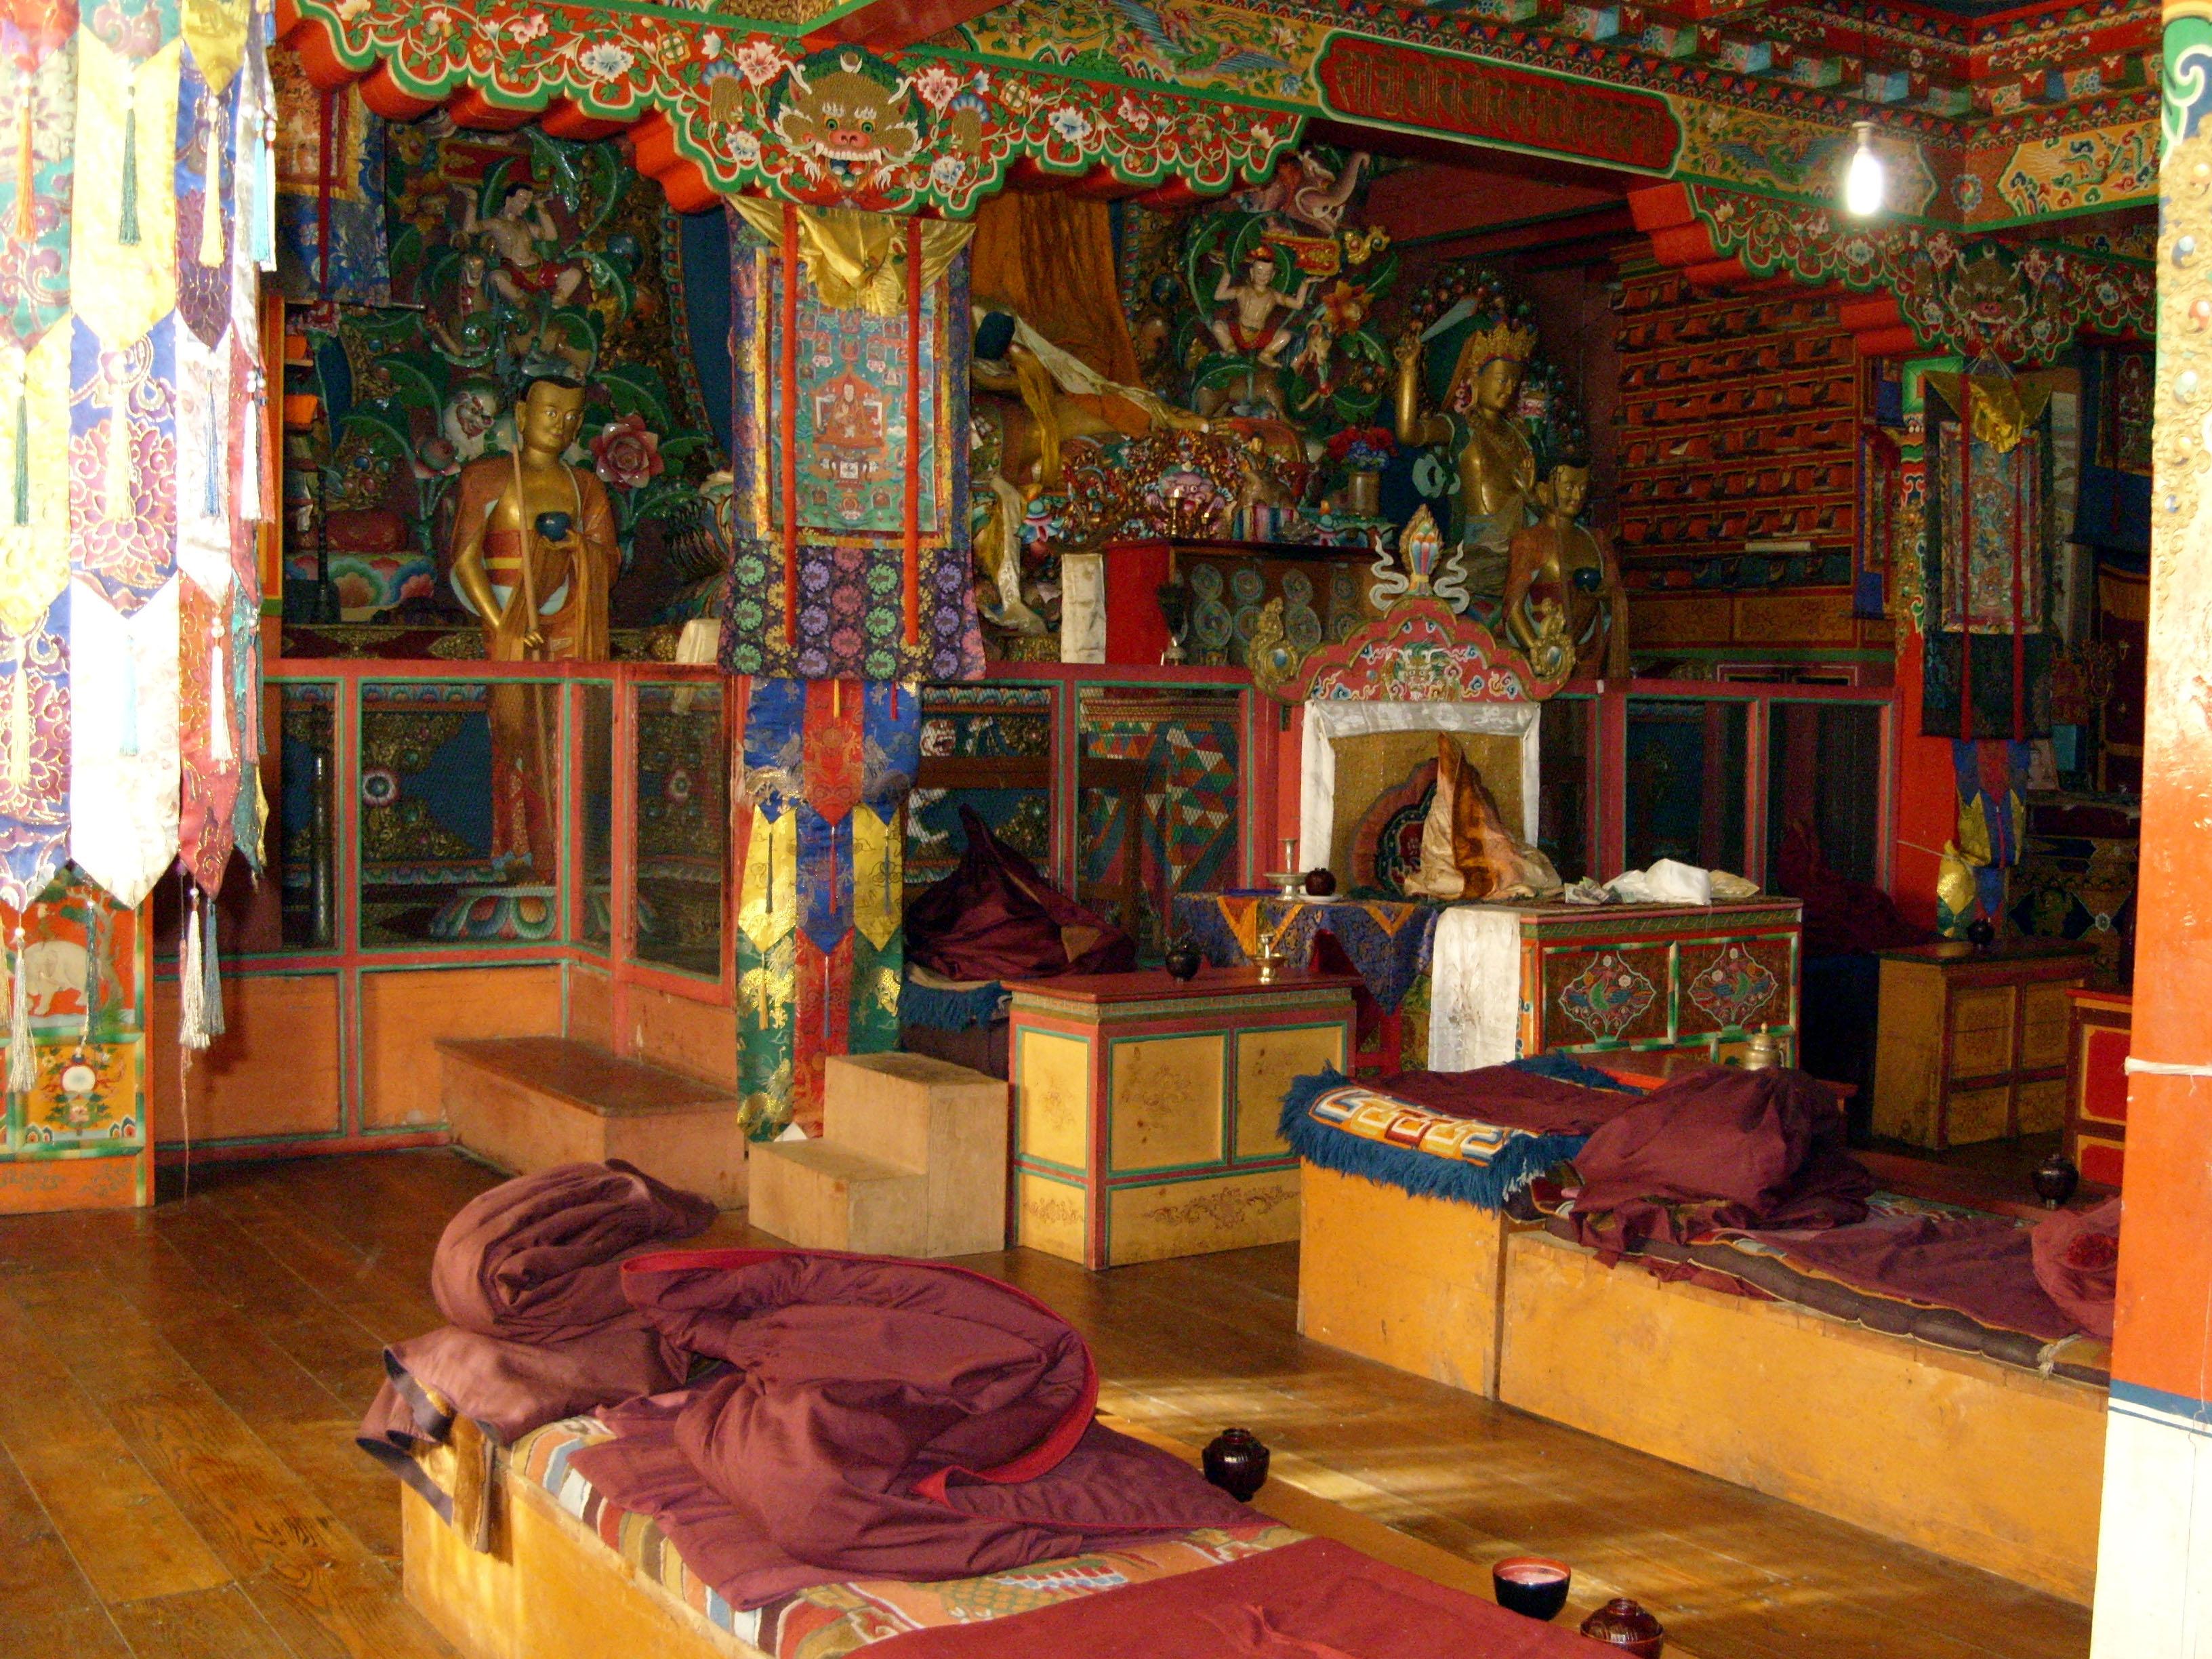 Kloster Tengboche